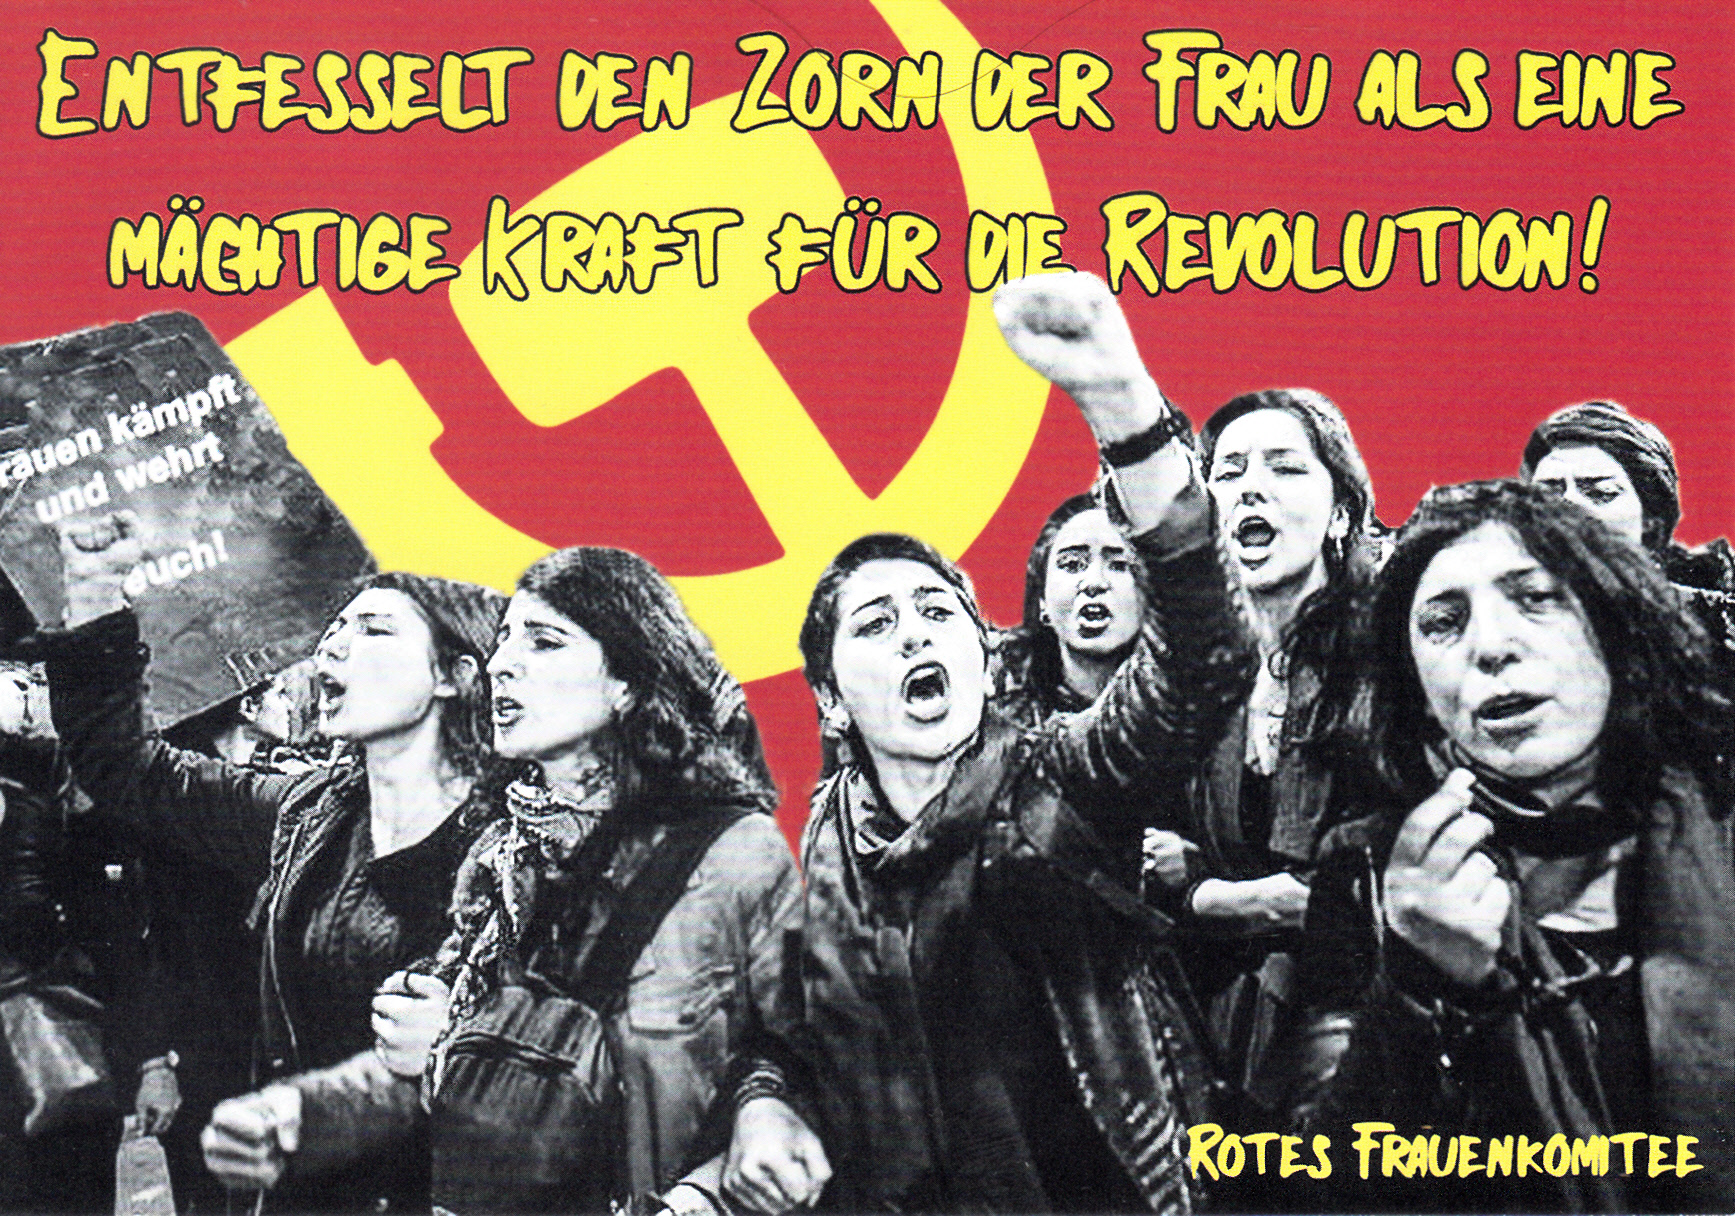 Rotes_Frauenkomitee_autoc_0001